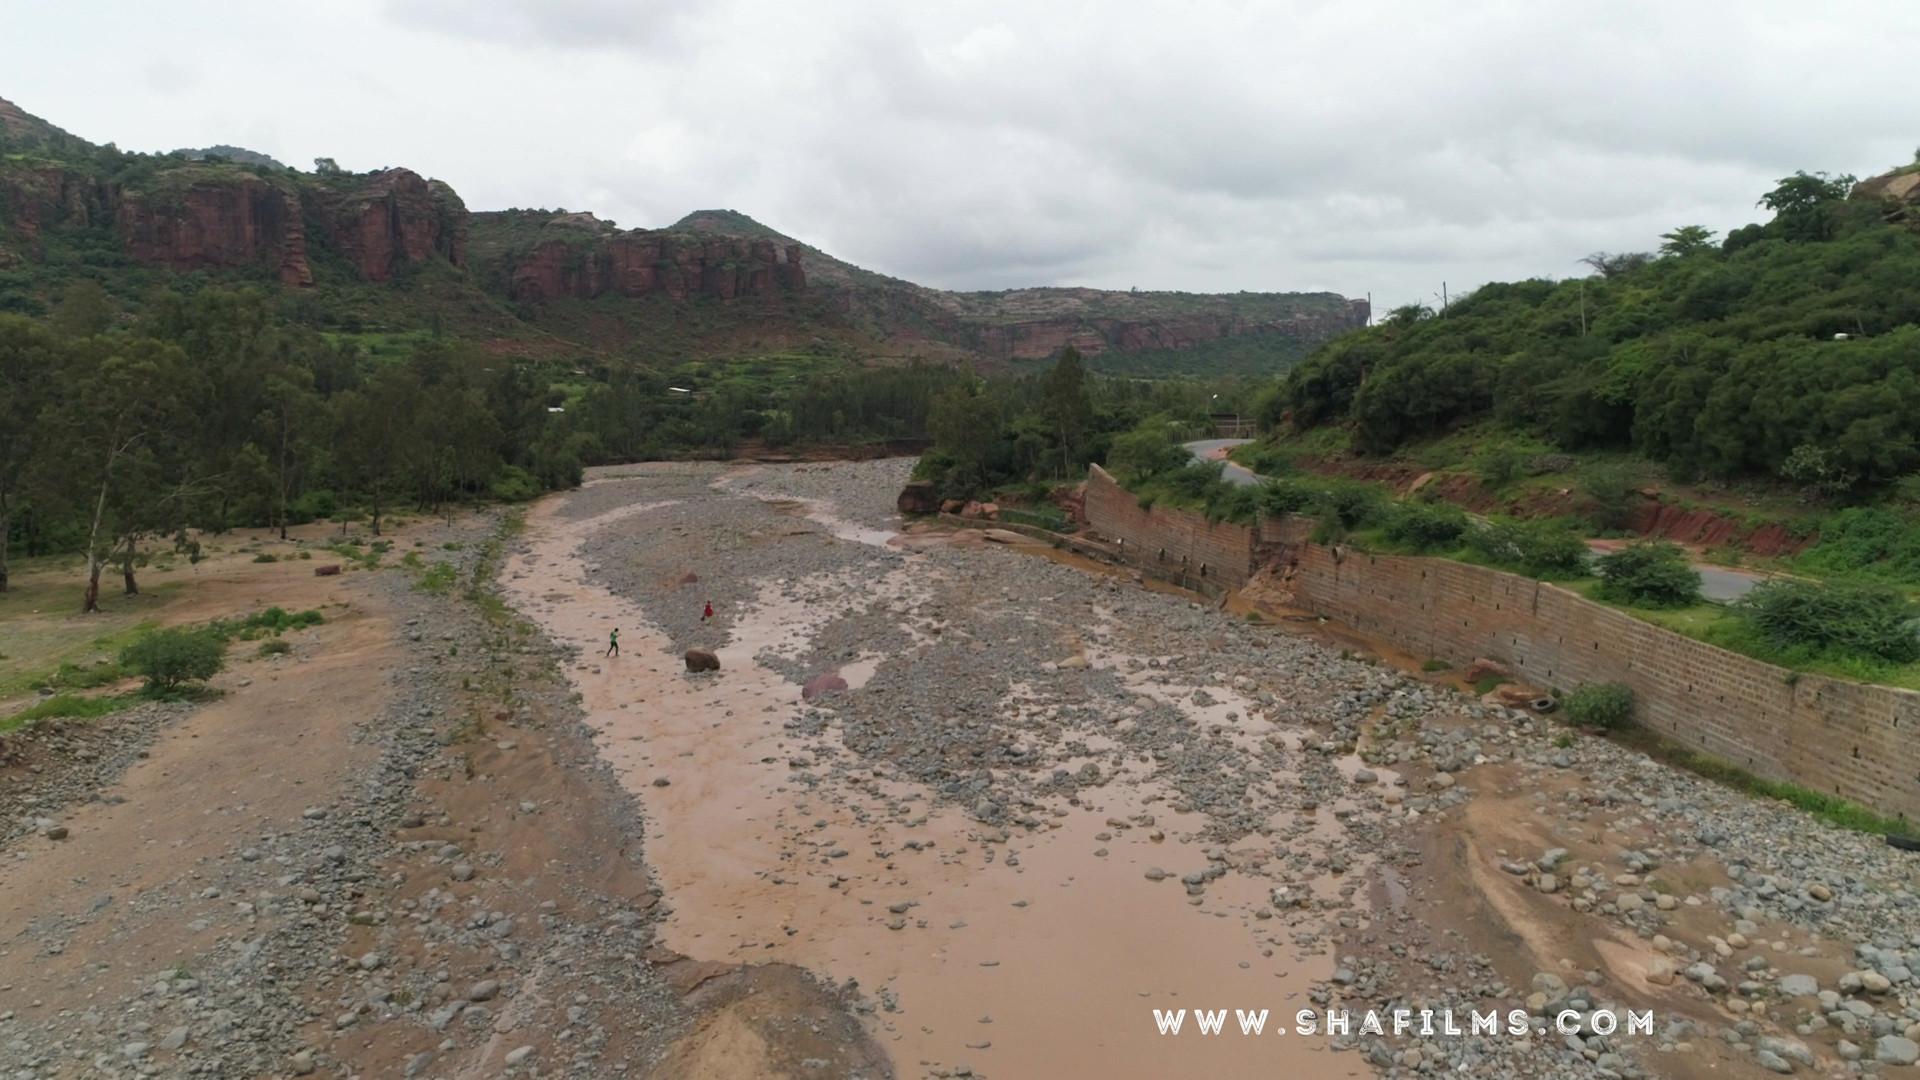 Aerial view of mountainous region in Mekelle, Ethiopia